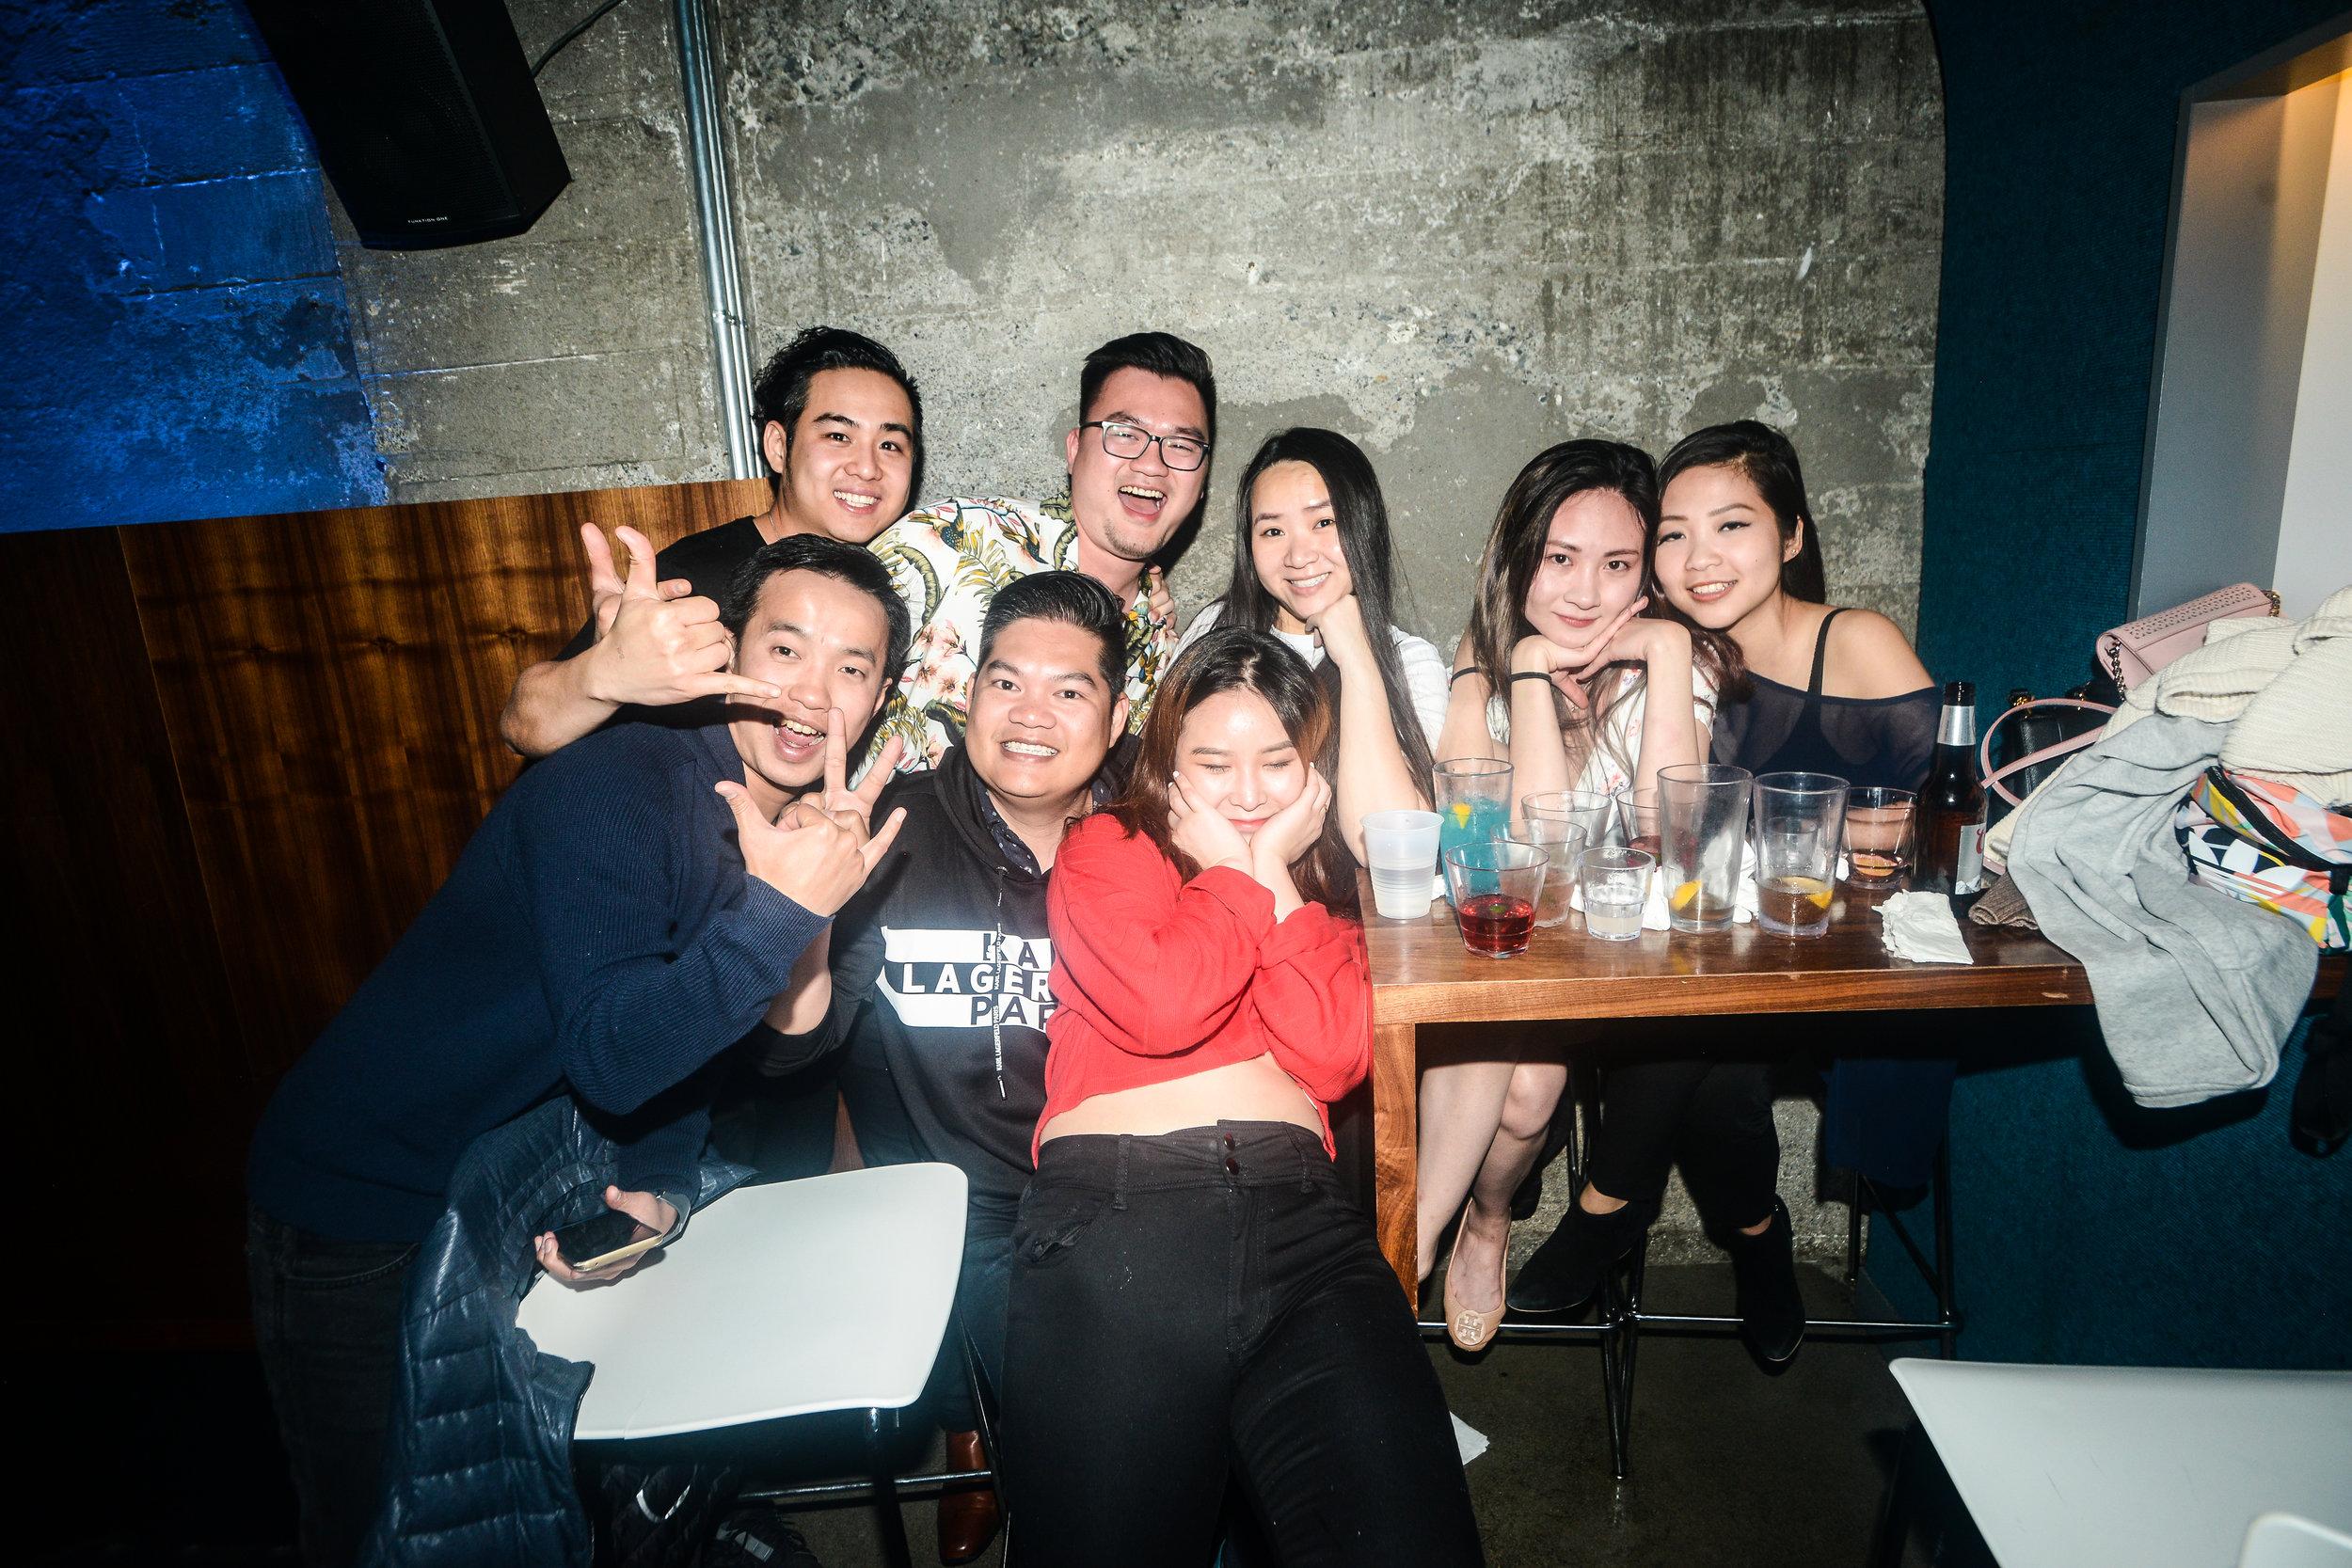 SBY_9692.jpg